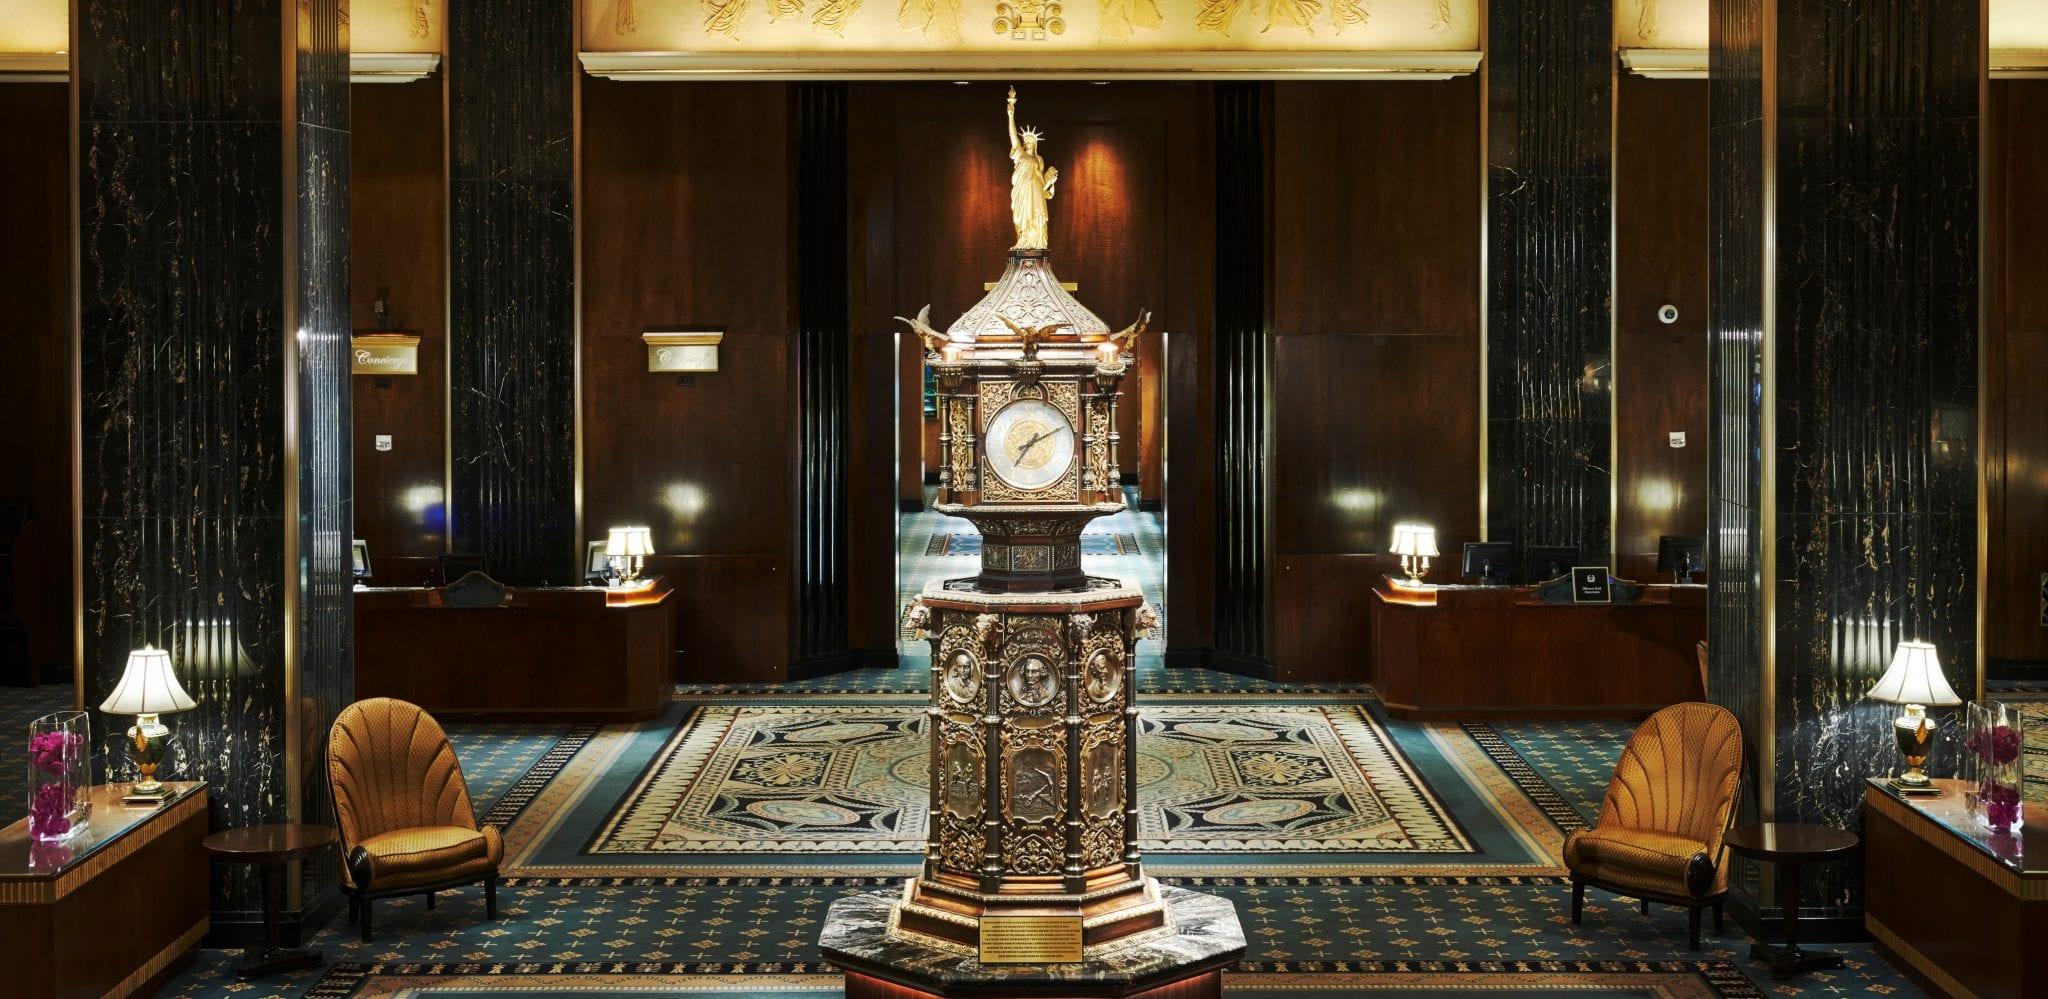 Waldorf Astoria New York lobby clock